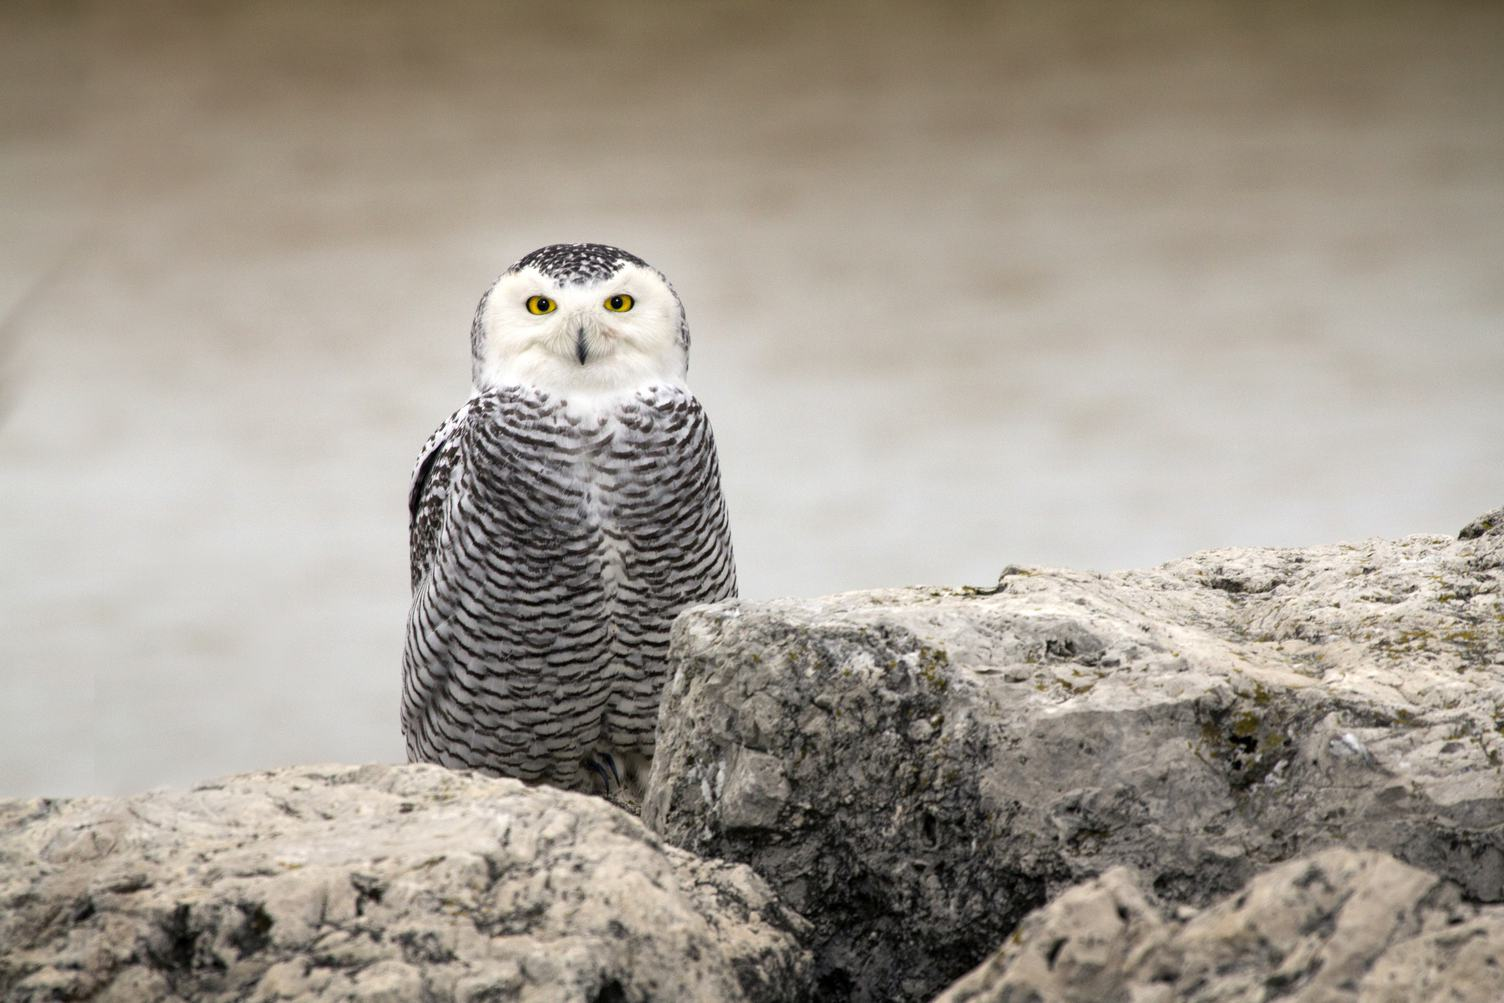 White Owl with Big Yellow Eyes on Rock